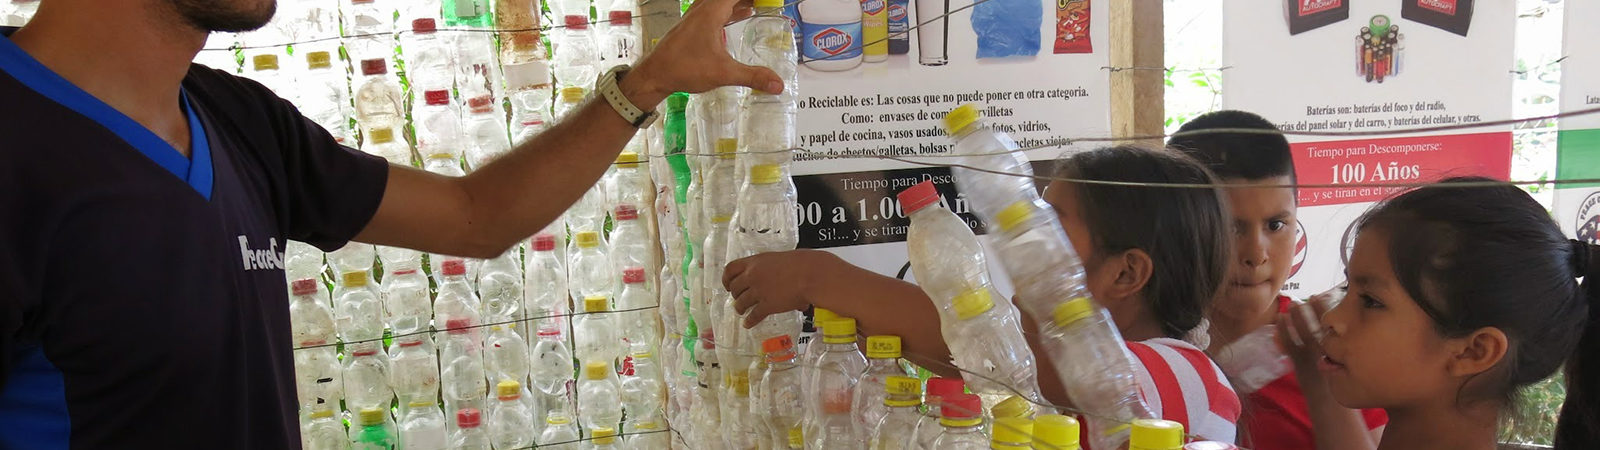 kids make soda bottle structure